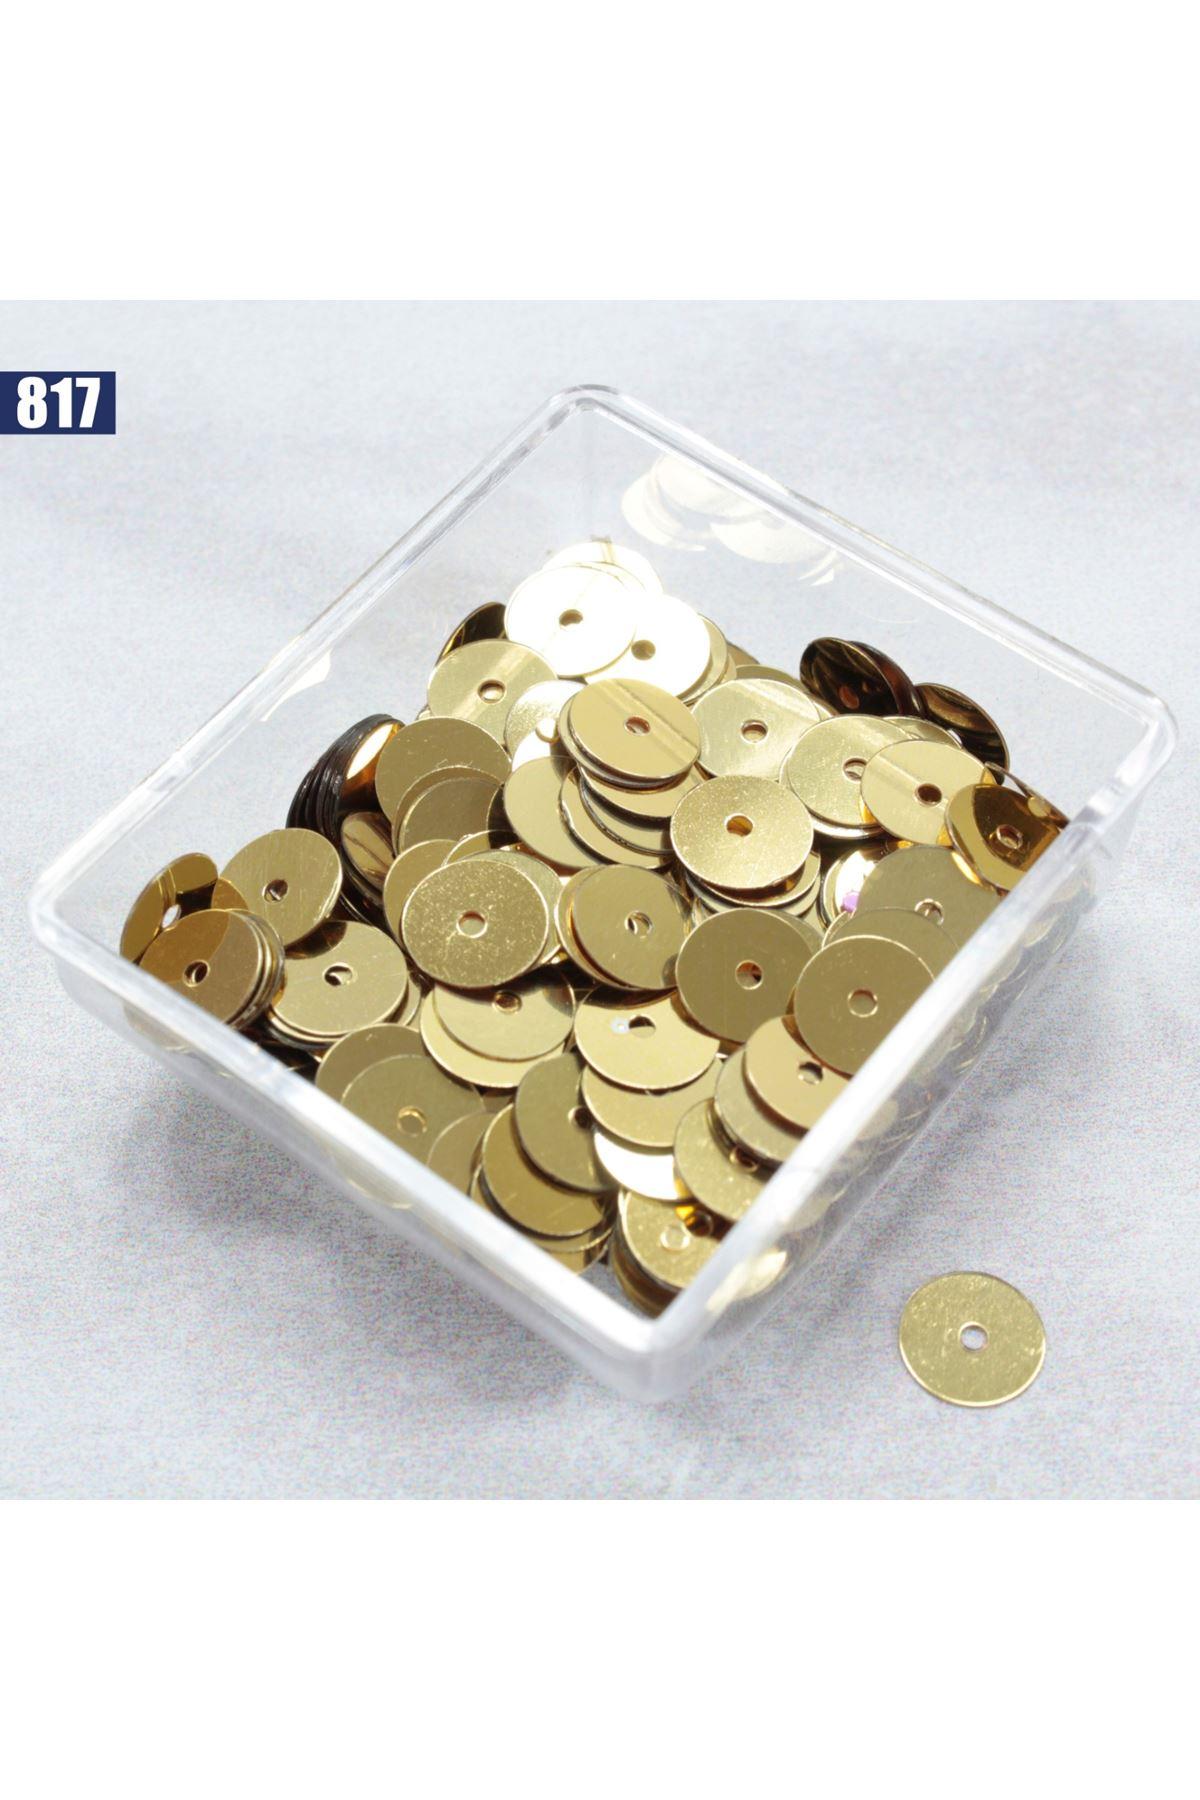 Pul 10 gram - 817